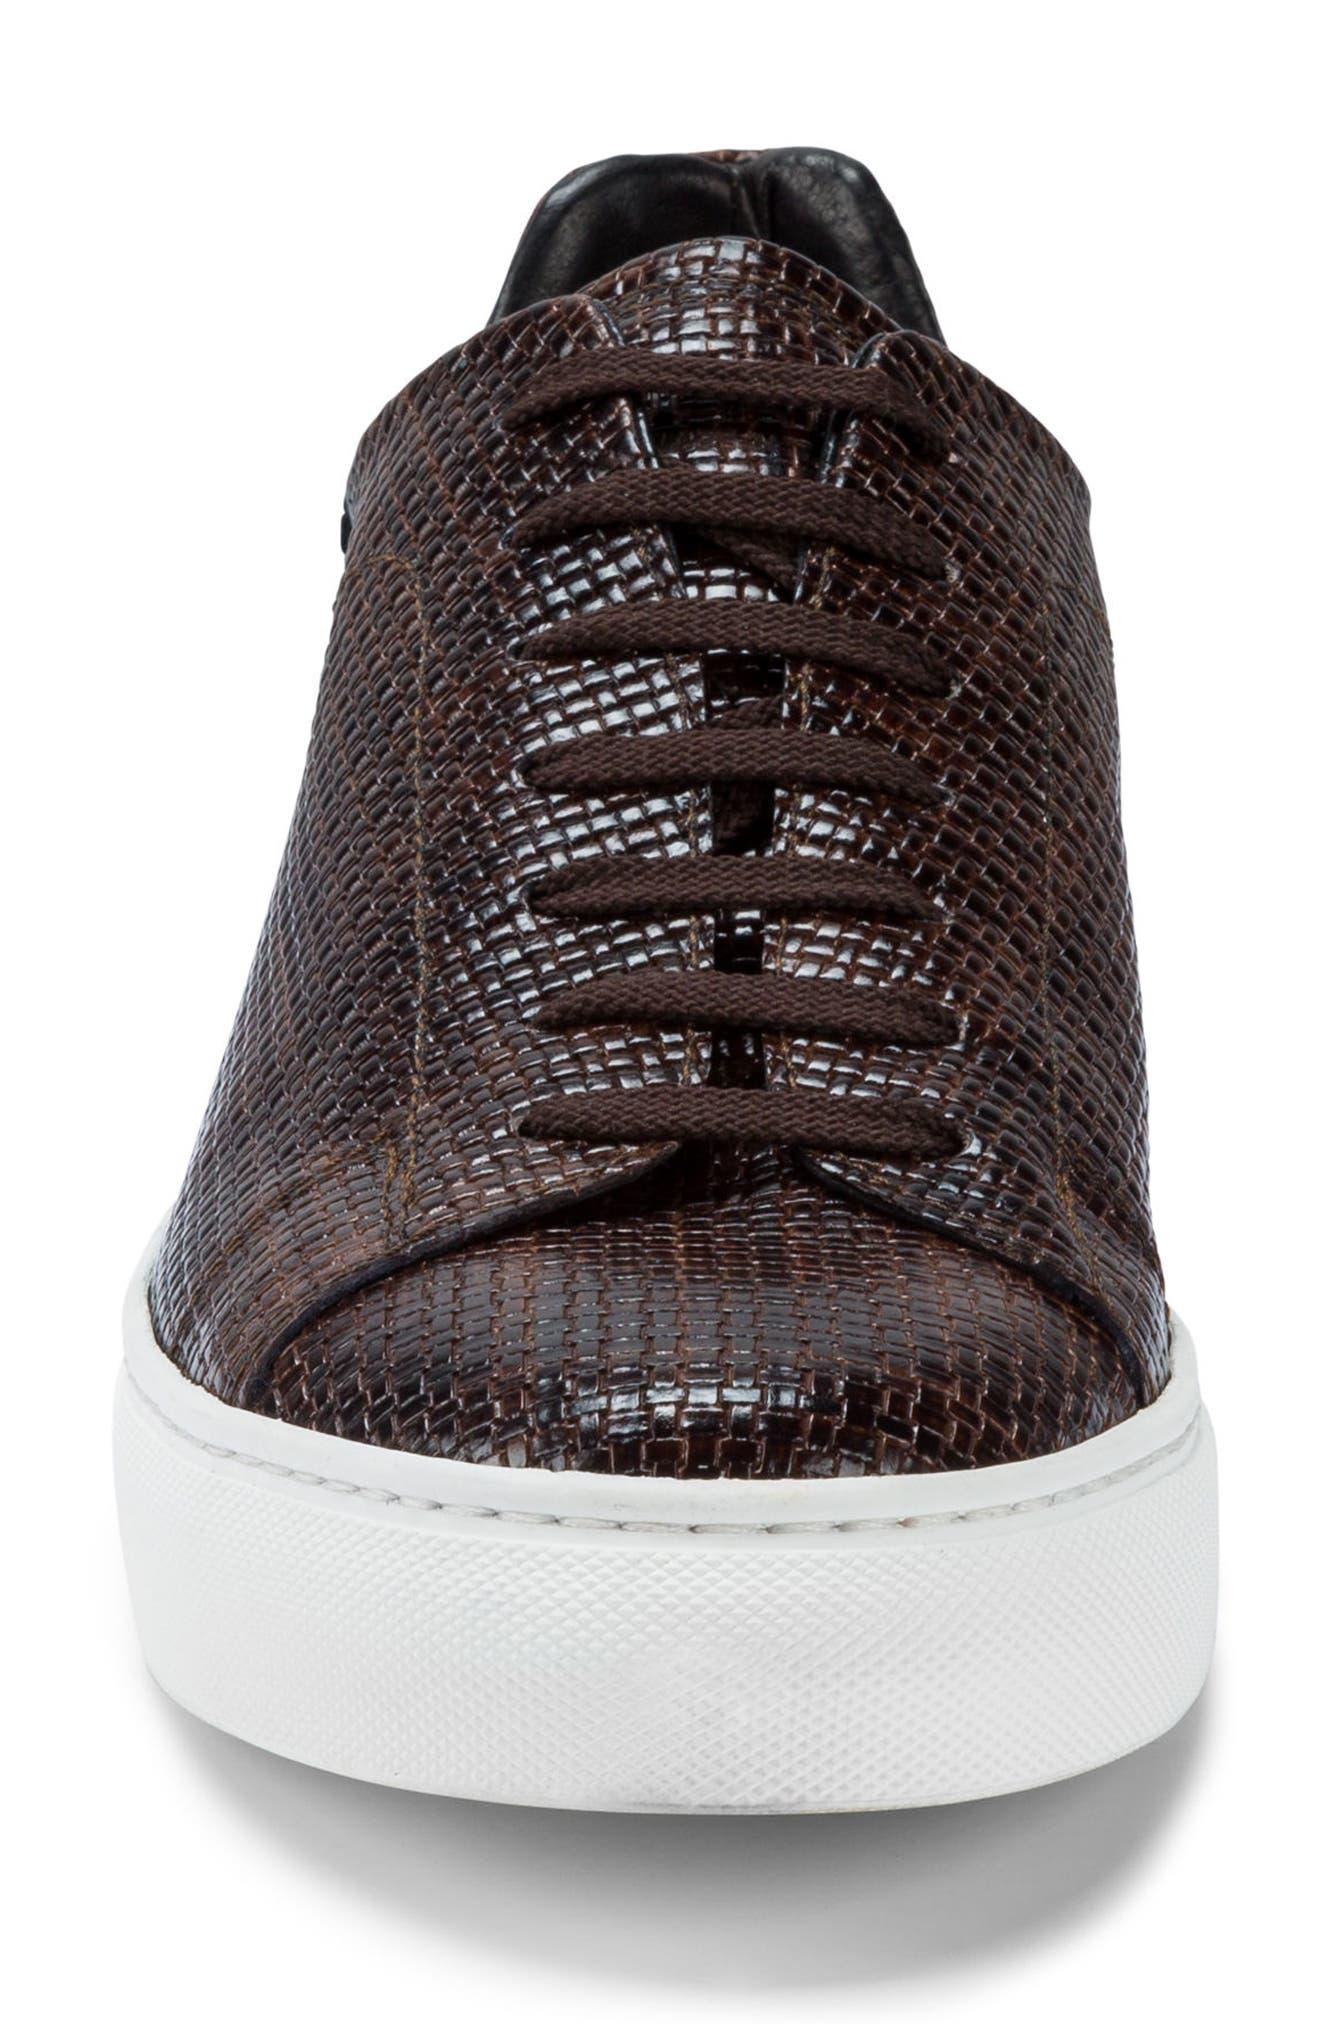 Wimbledon Sneaker,                             Alternate thumbnail 4, color,                             203